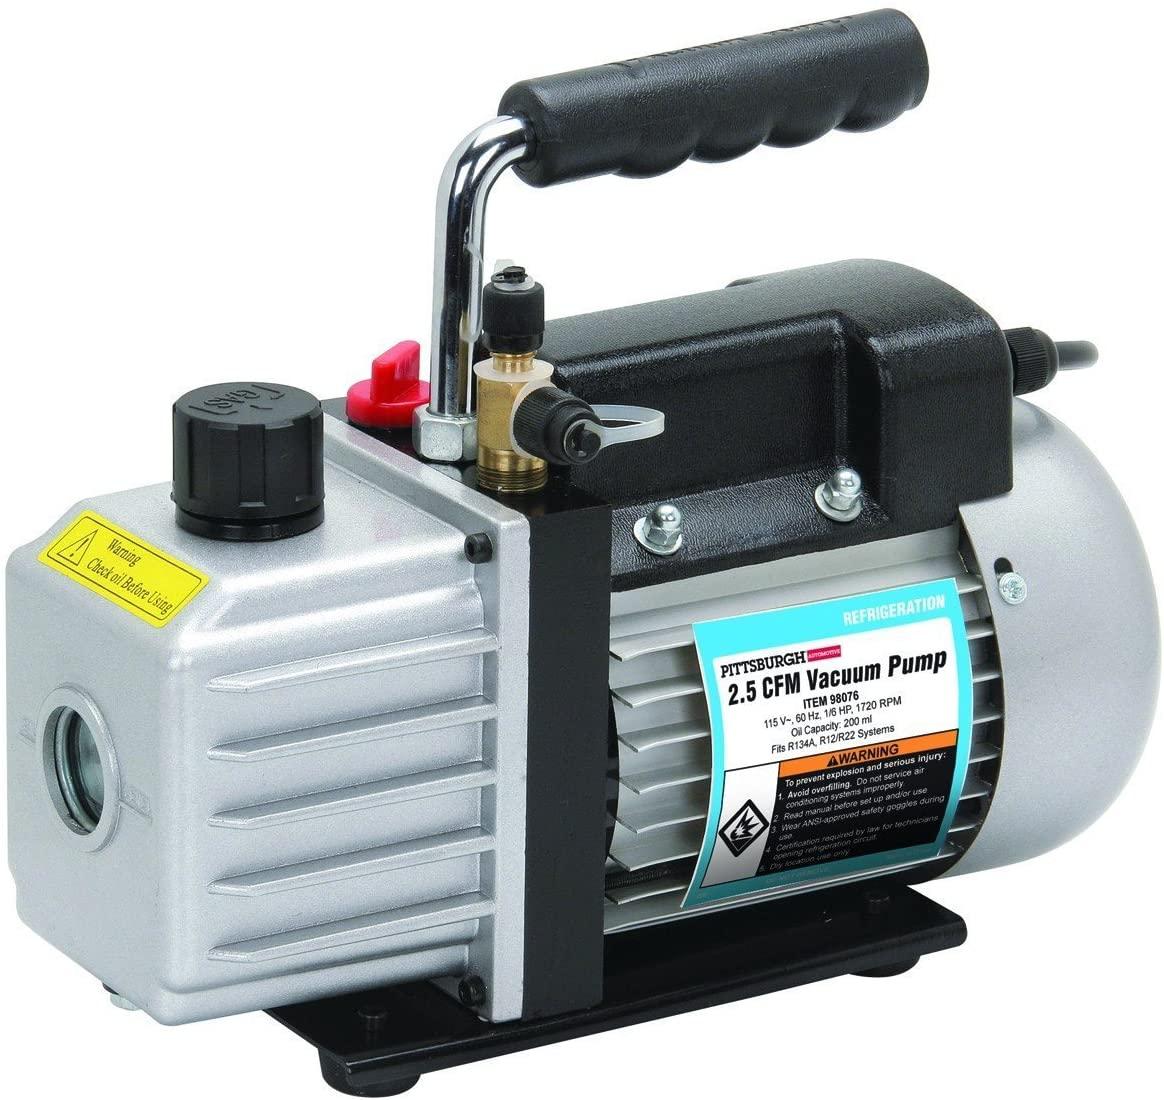 2.5 CFM 1/6 HP One Stage Vacuum Pump Air Conditioning HVAC